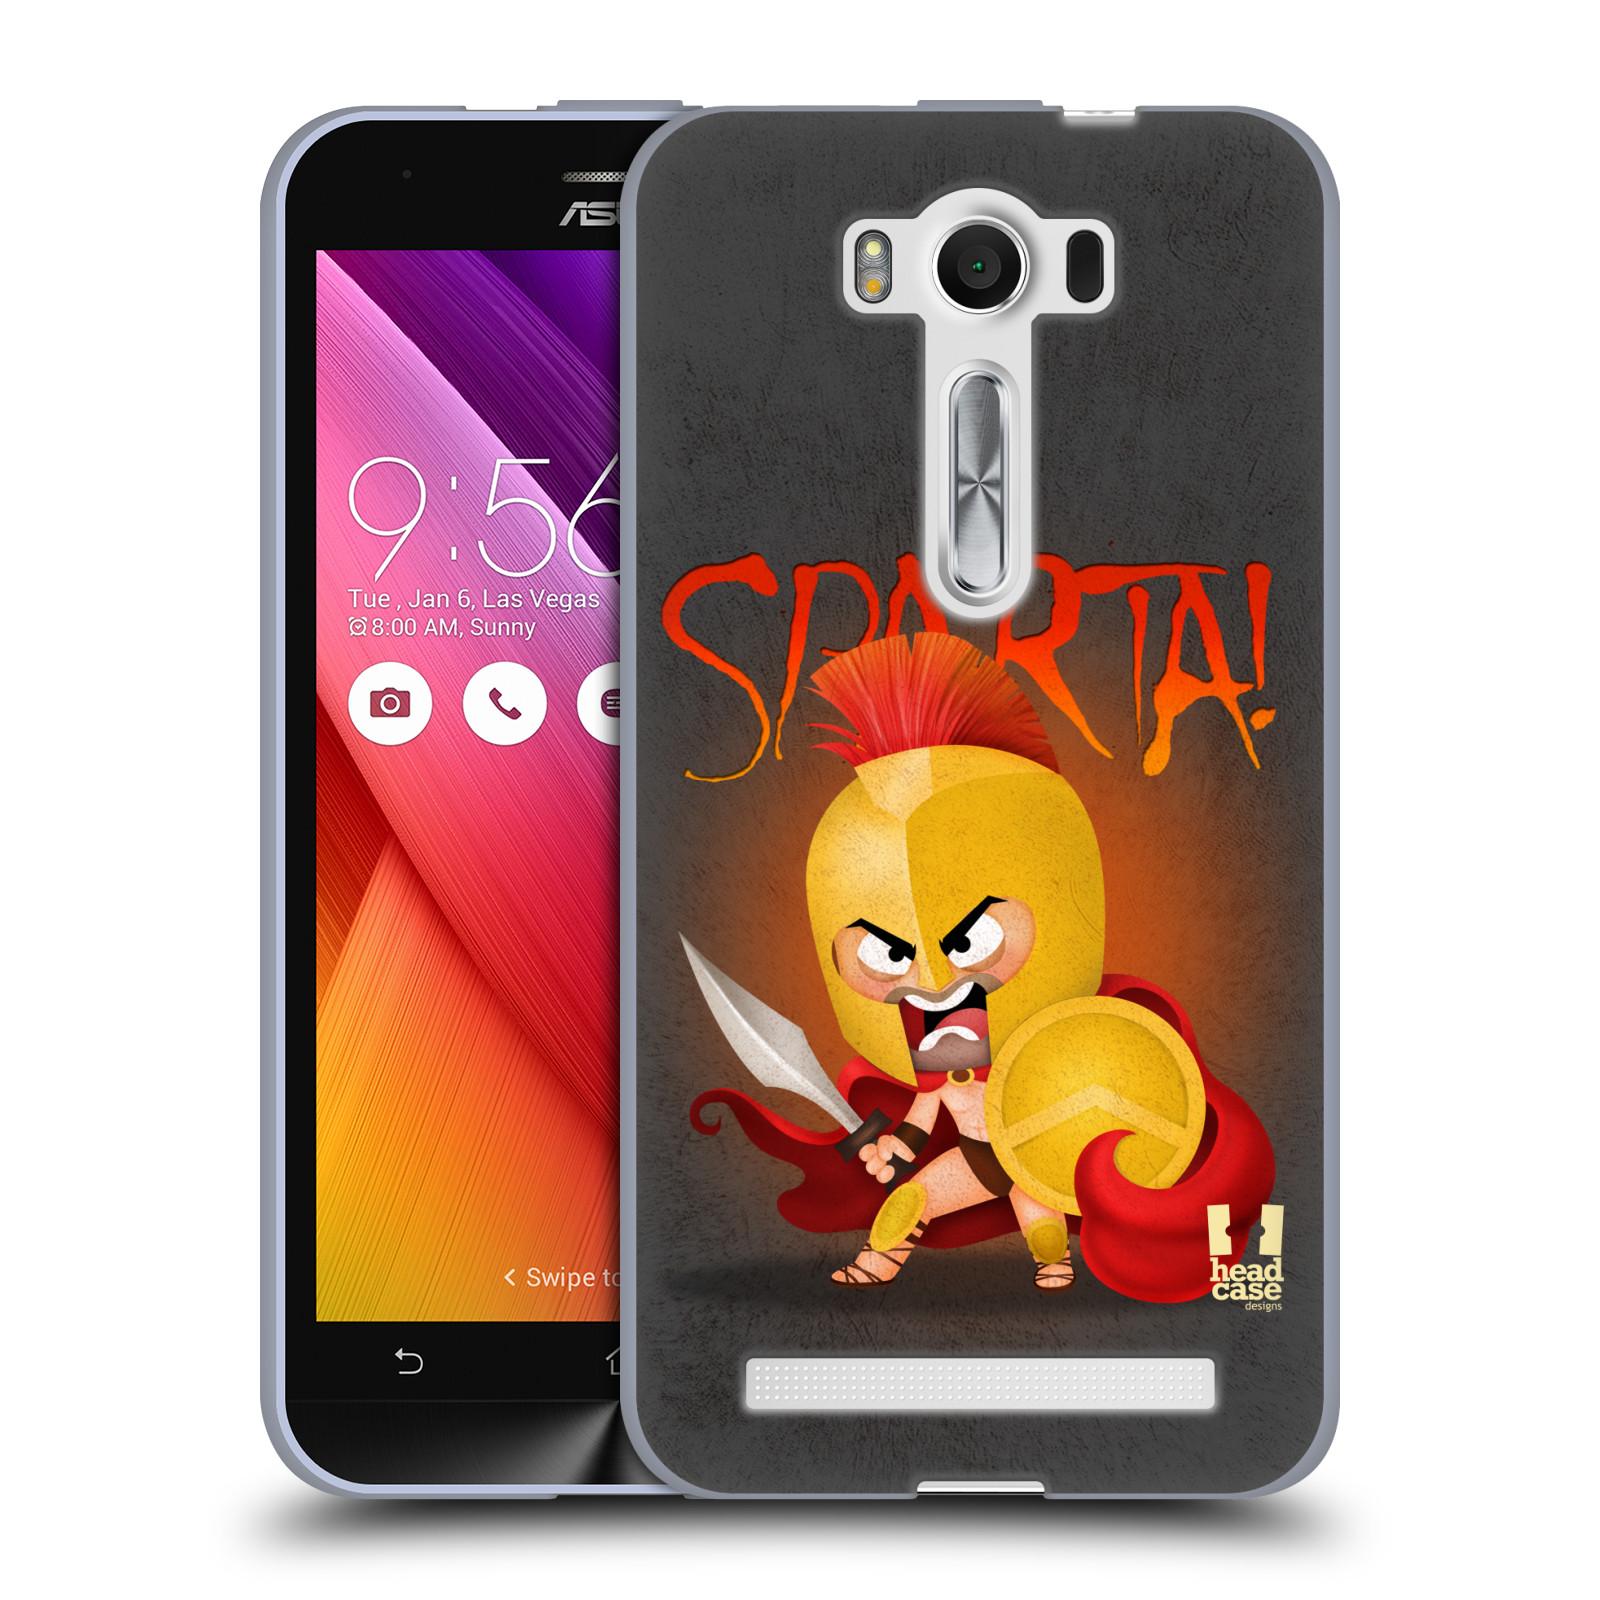 "Silikonové pouzdro na mobil Asus ZenFone 2 Laser ZE500KL HEAD CASE Sparta (Silikonový kryt či obal na mobilní telefon Asus ZenFone 2 Laser ZE500KL s 5"" displejem)"